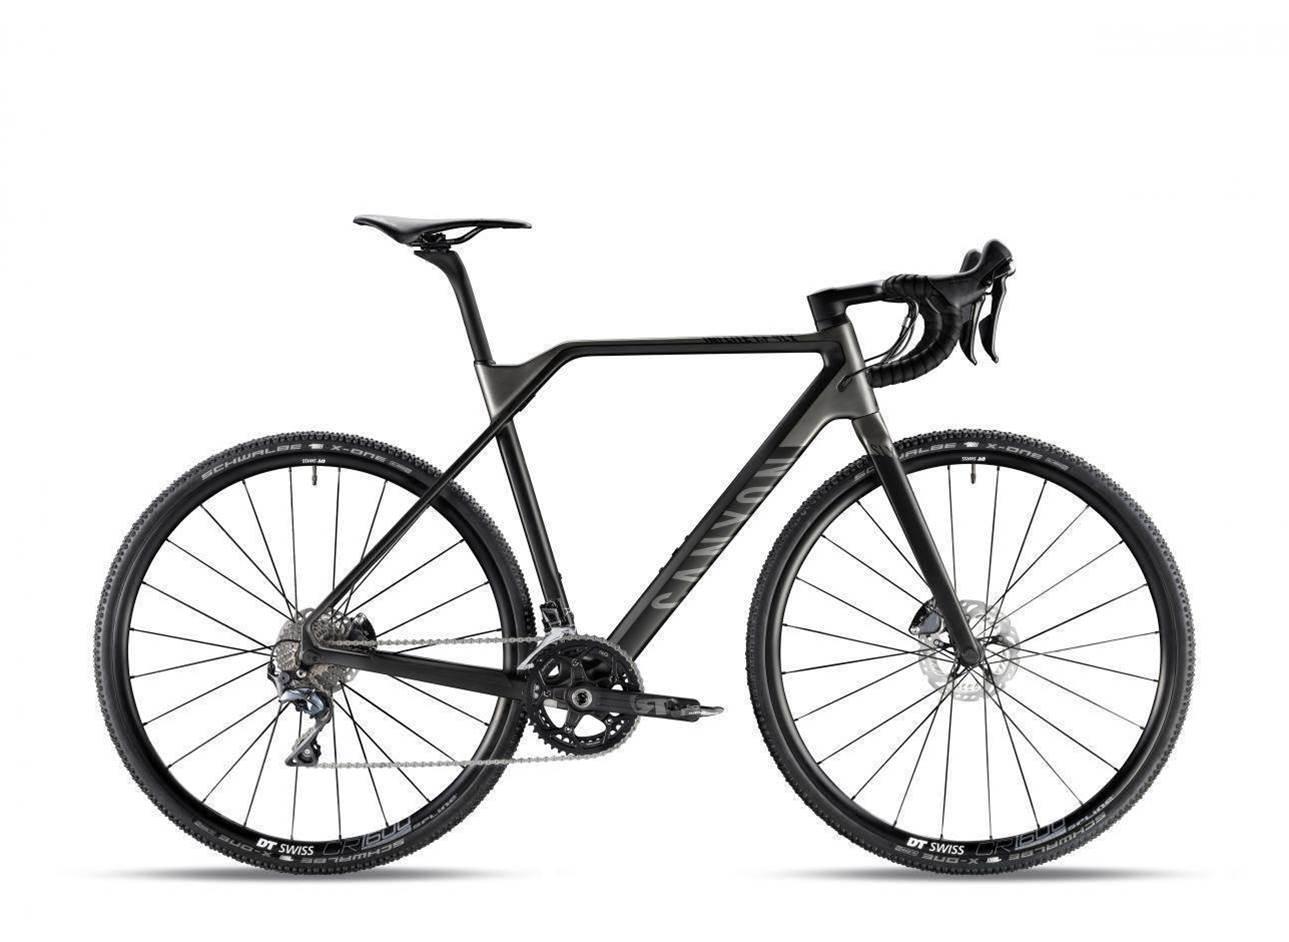 Canyon unveil full-carbon Inflite CF SLX cyclocross bike